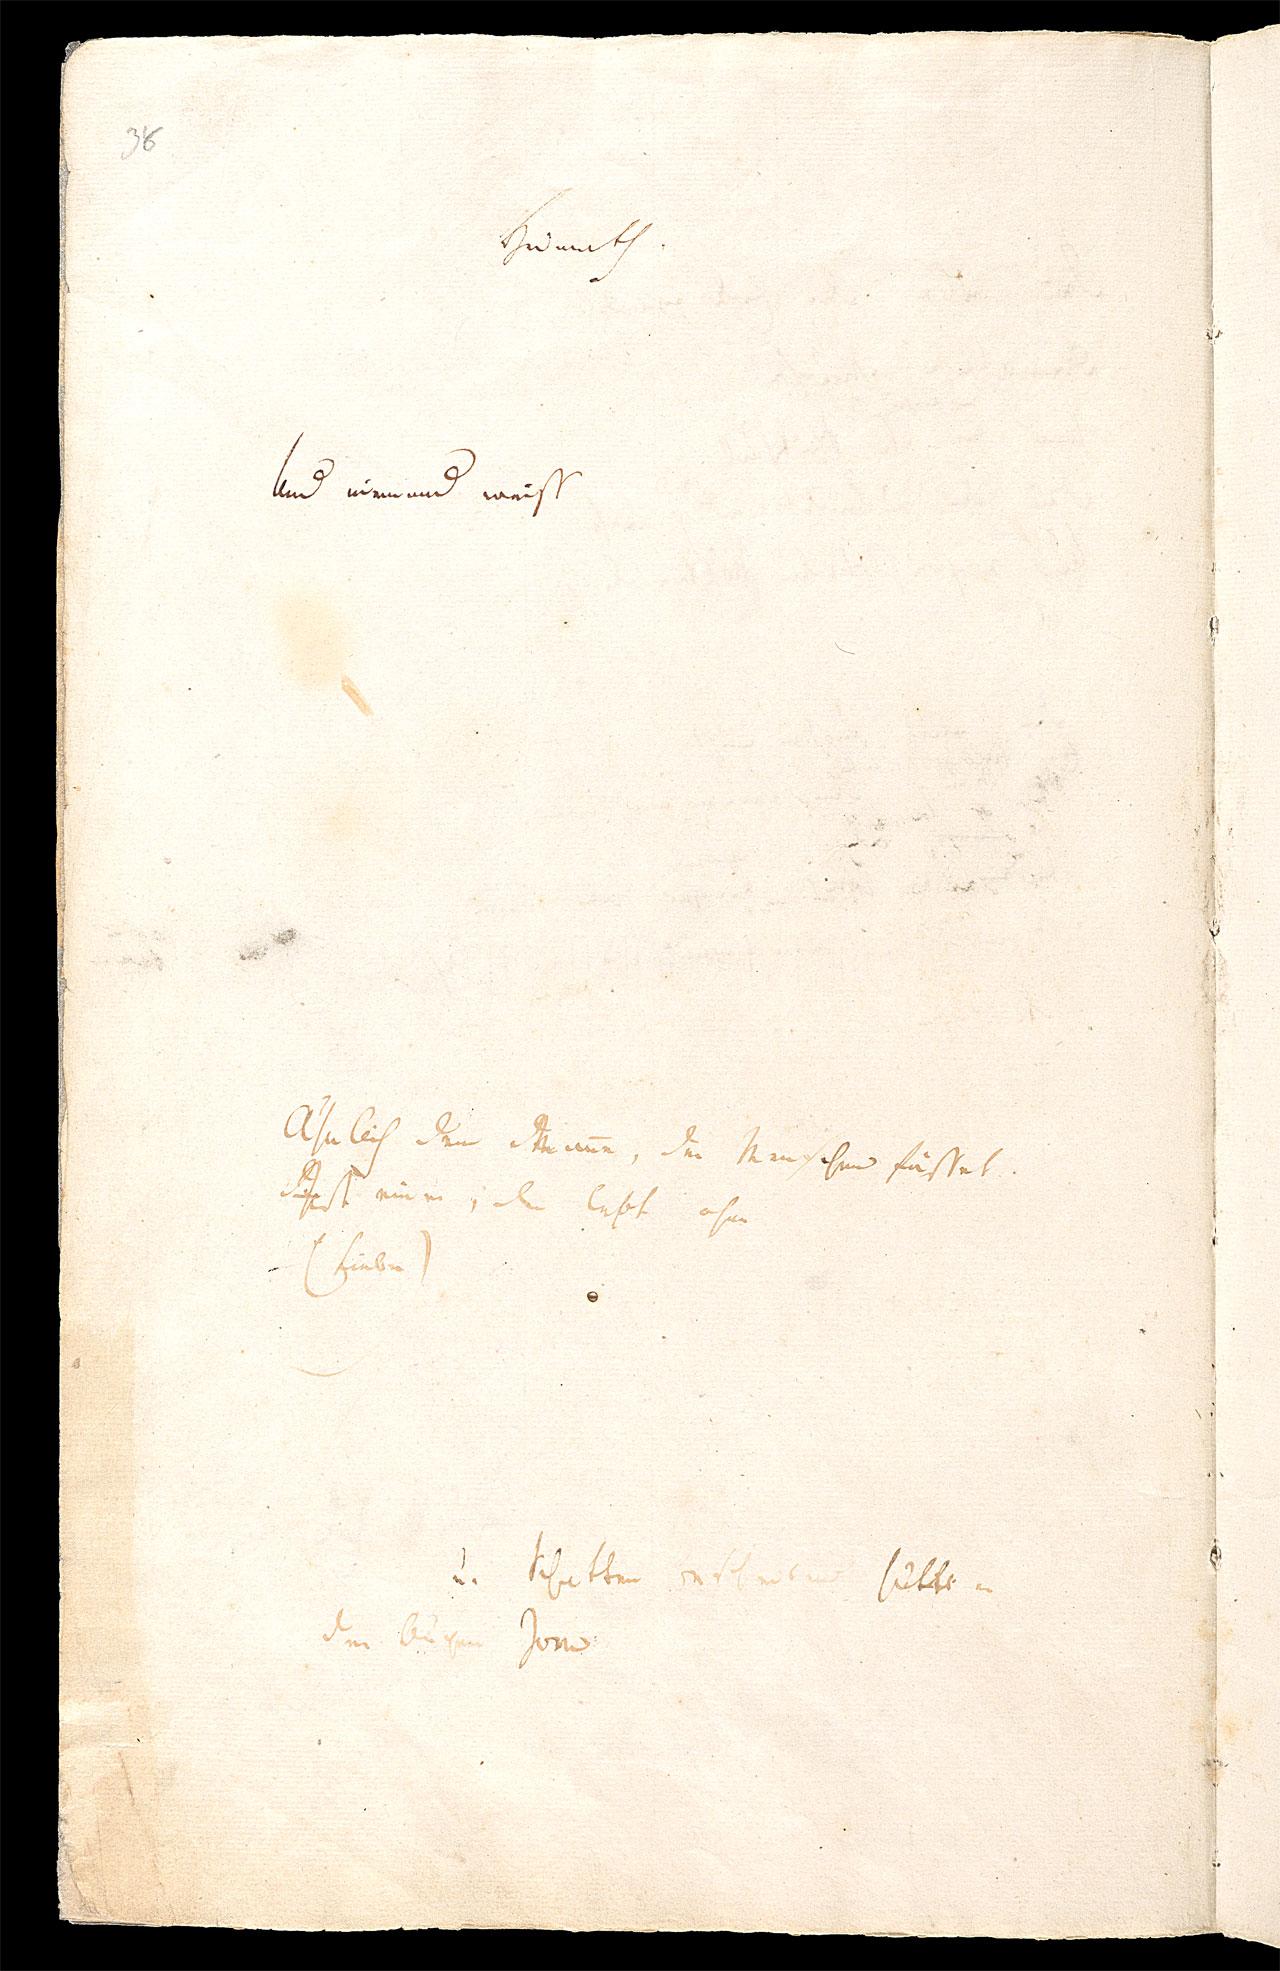 Friedrich Hölderlin, Homburger Folioheft, Seite 38, Heimath, Handschrift